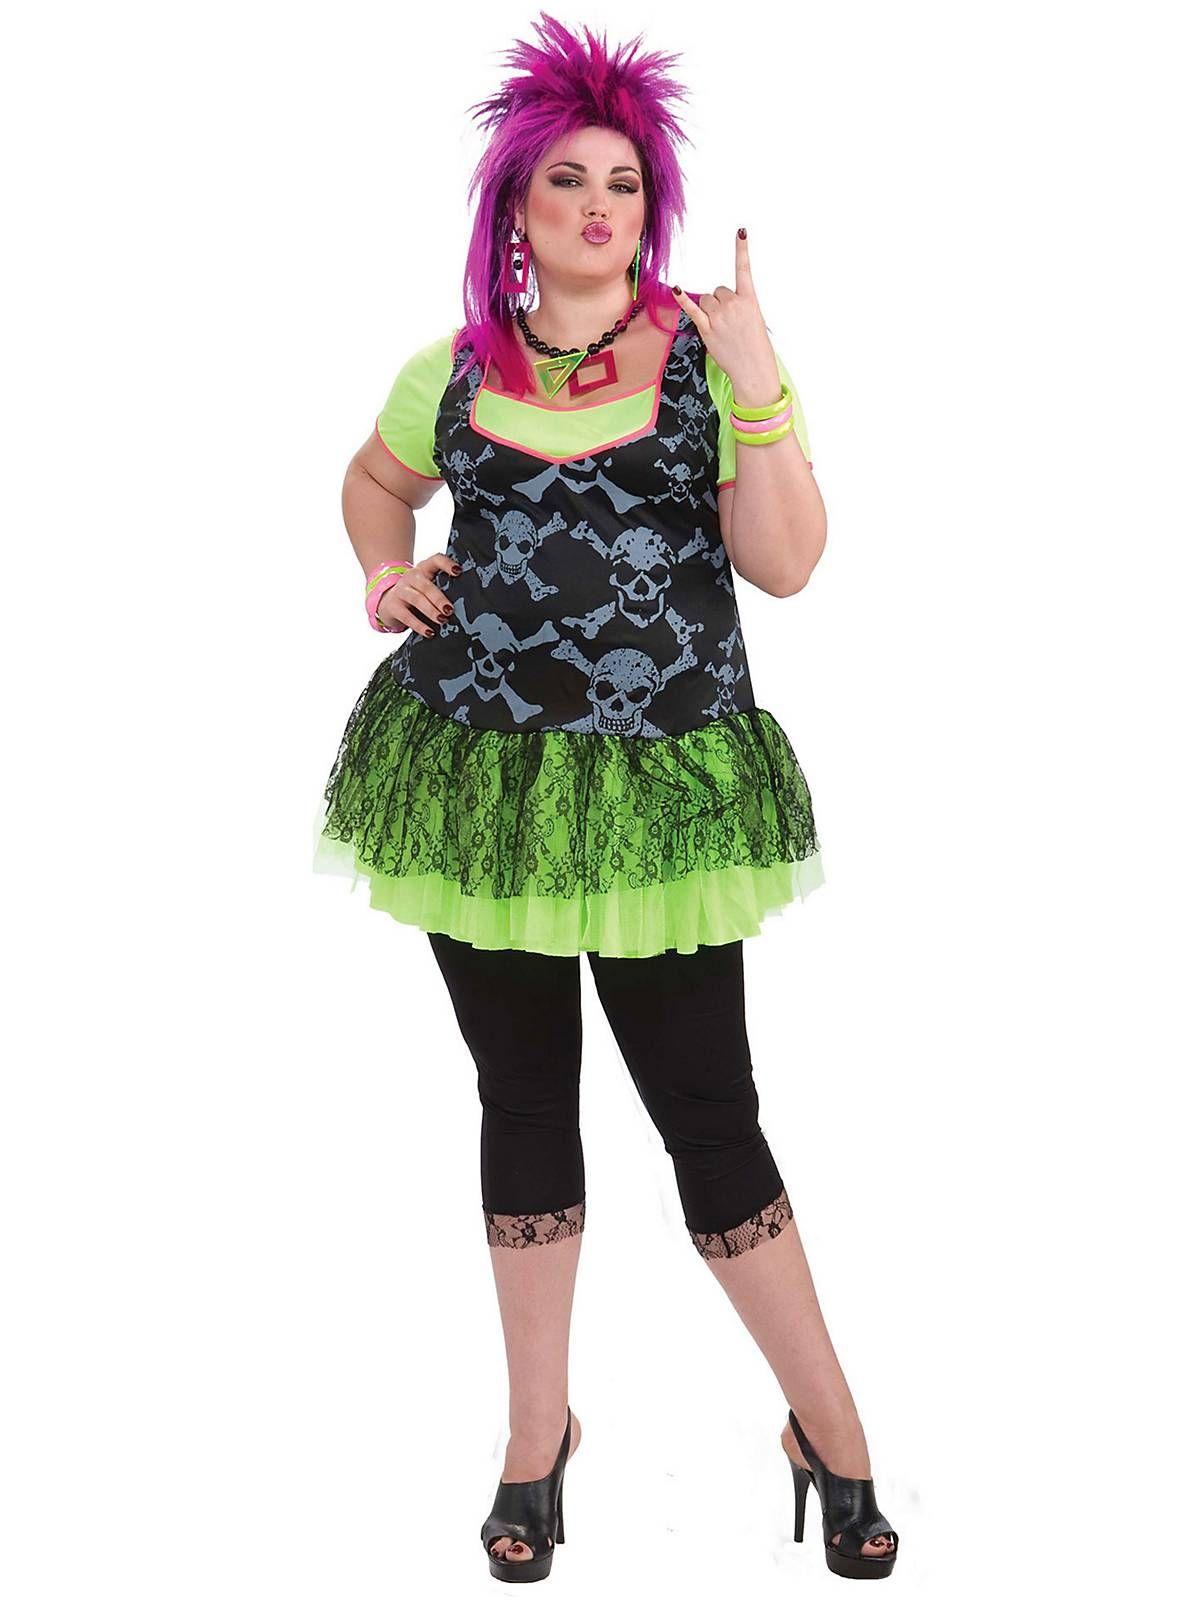 80u0027s Punk Lady Costume | Plus Size 80s Halloween Costumes  sc 1 st  Pinterest & 80u0027s Punk Lady Costume | Plus Size 80s Halloween Costumes ...